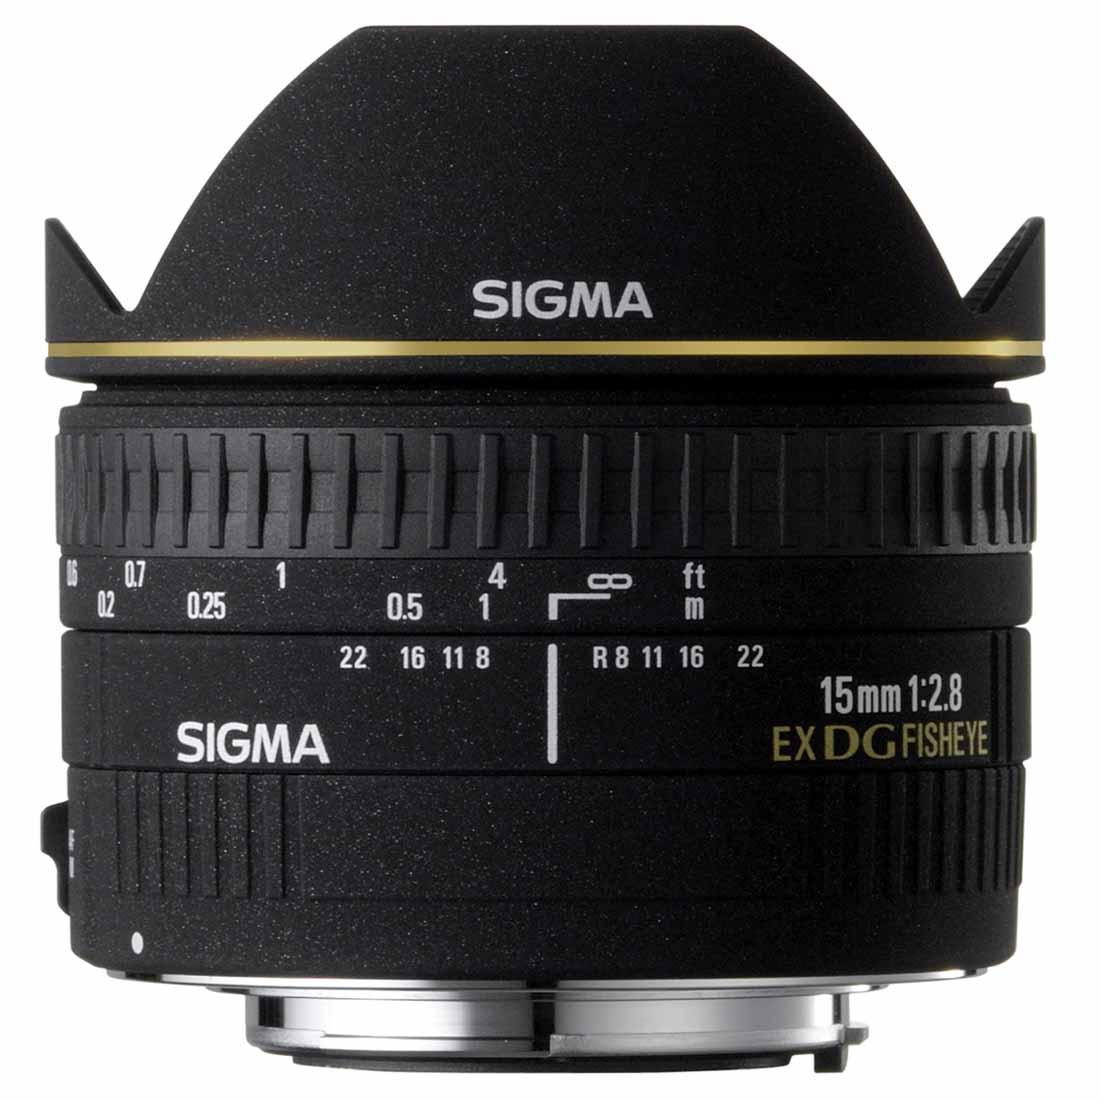 Objektiv Sigma 15 mm f/2.8 EX DG Diagonal Fisheye